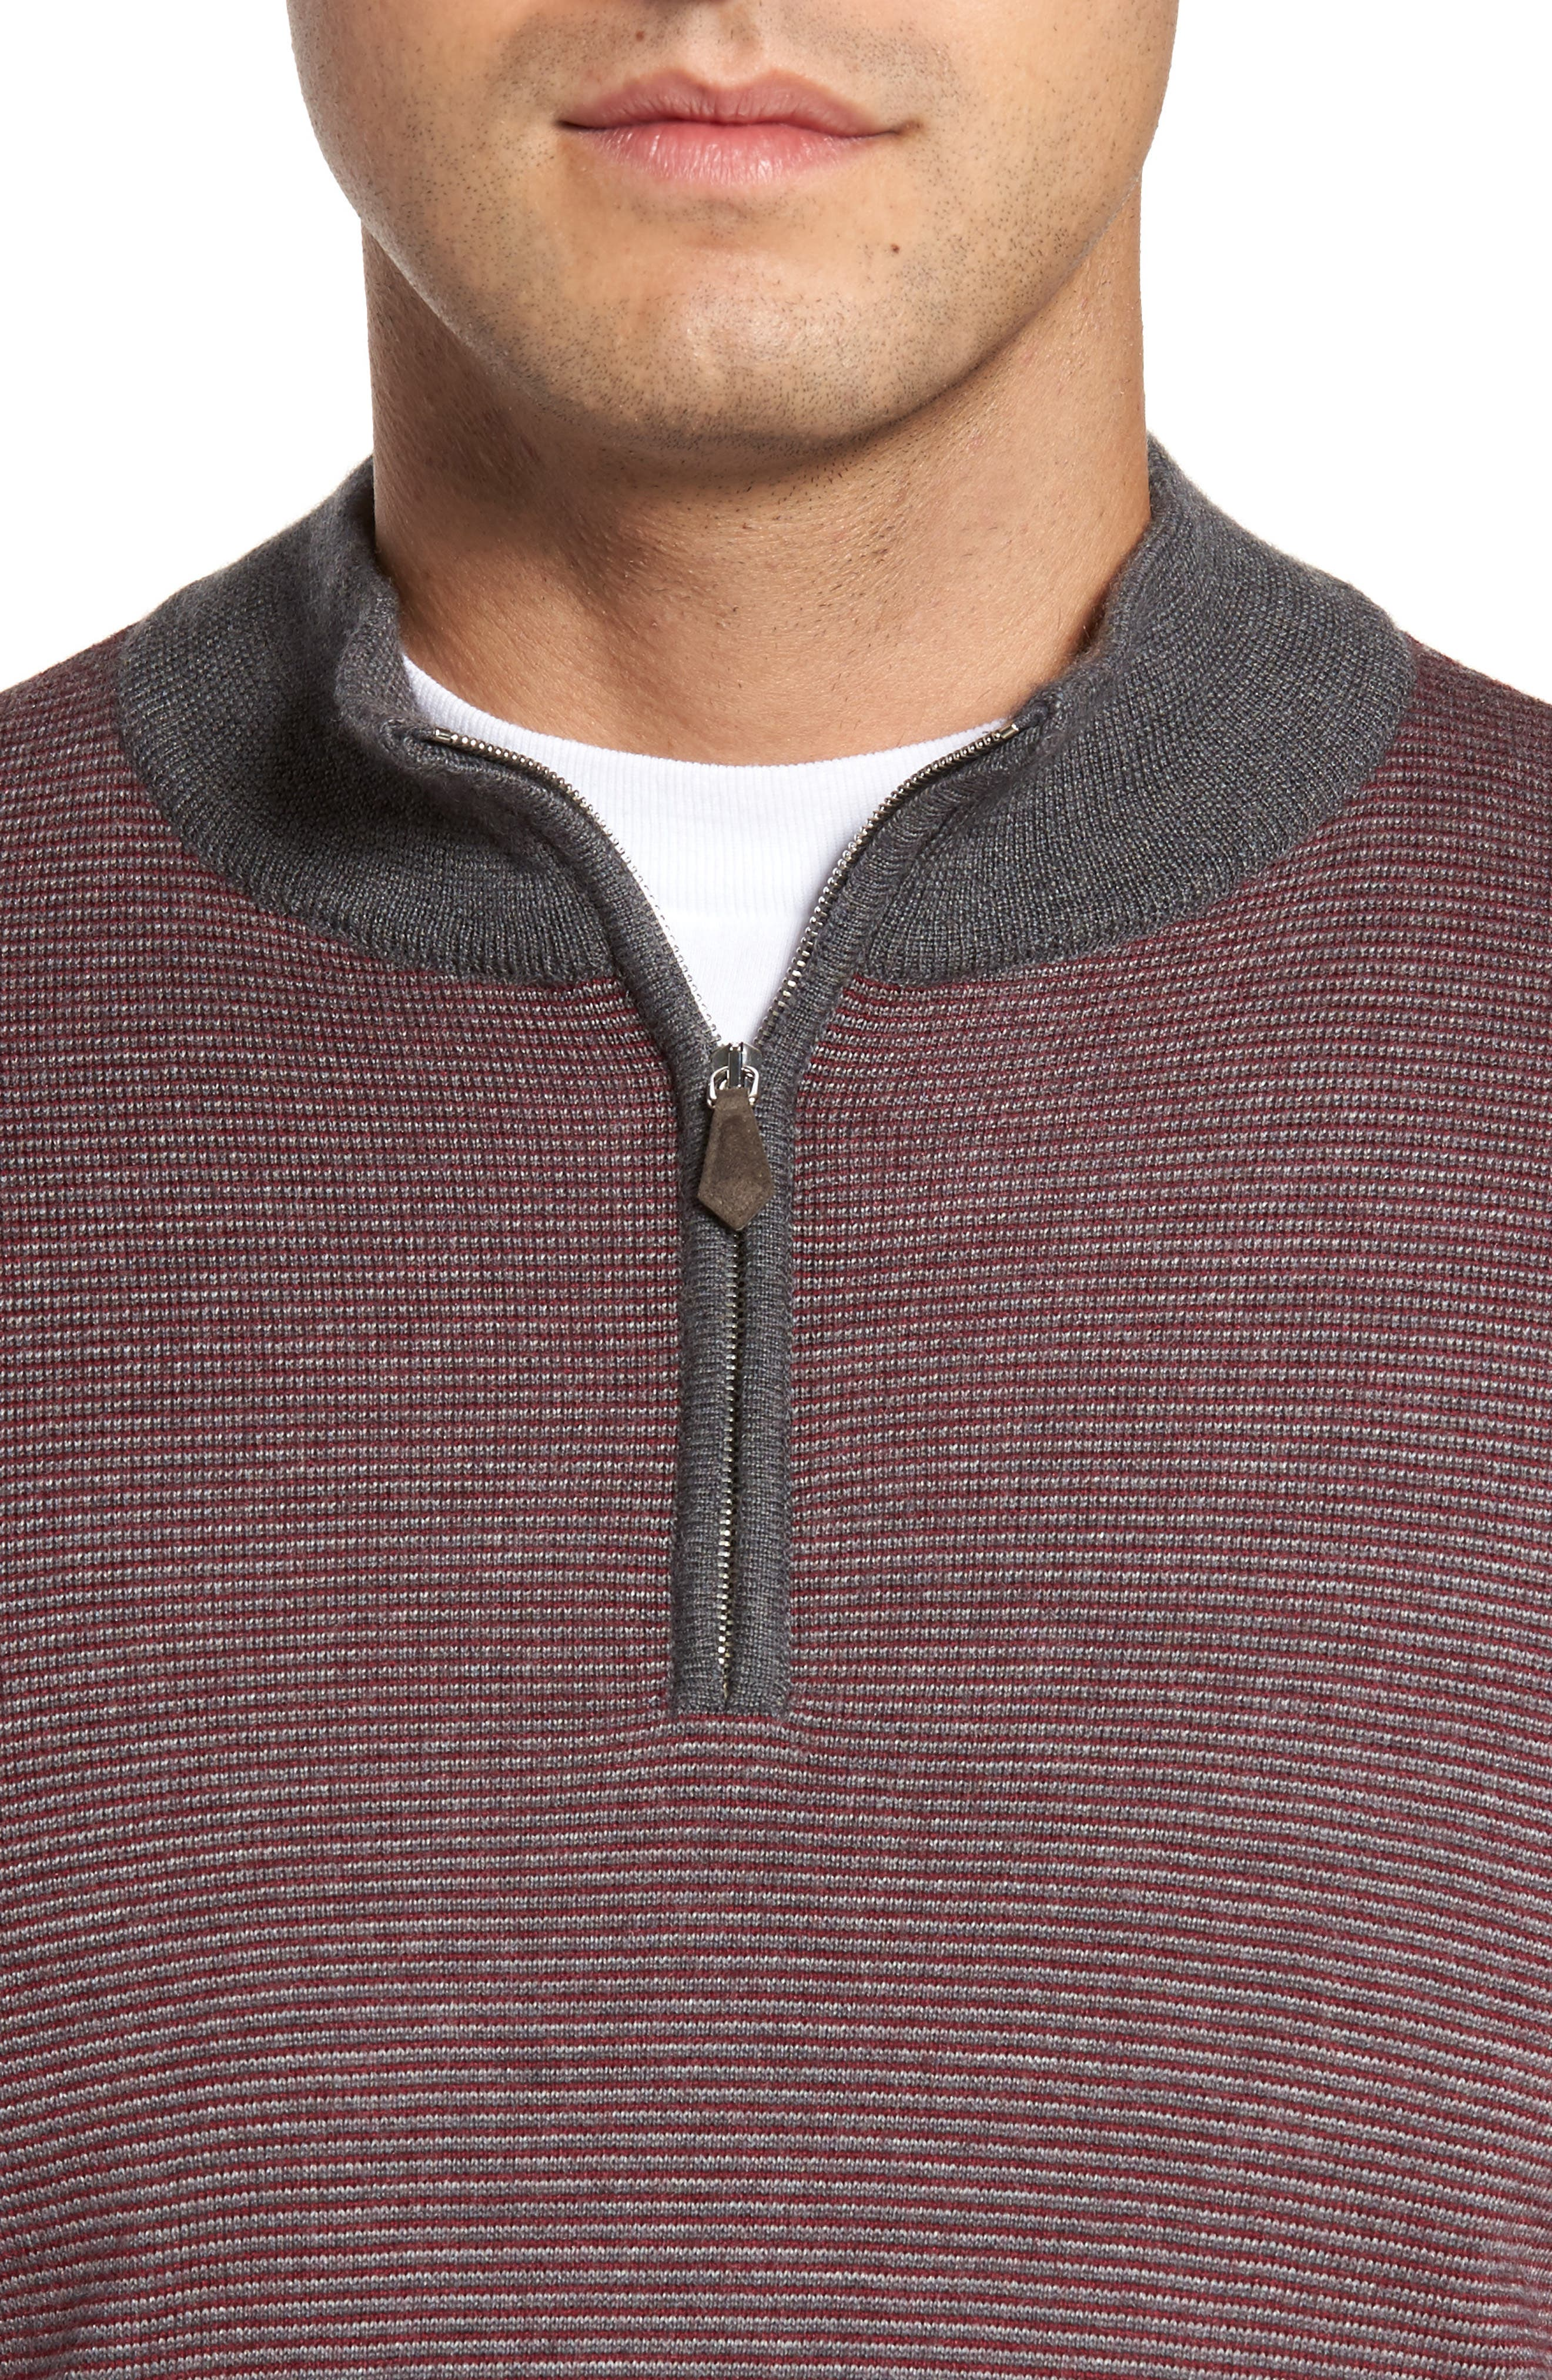 Trichrome Stripe Merino Wool Blend Sweater,                             Alternate thumbnail 4, color,                             Chianti